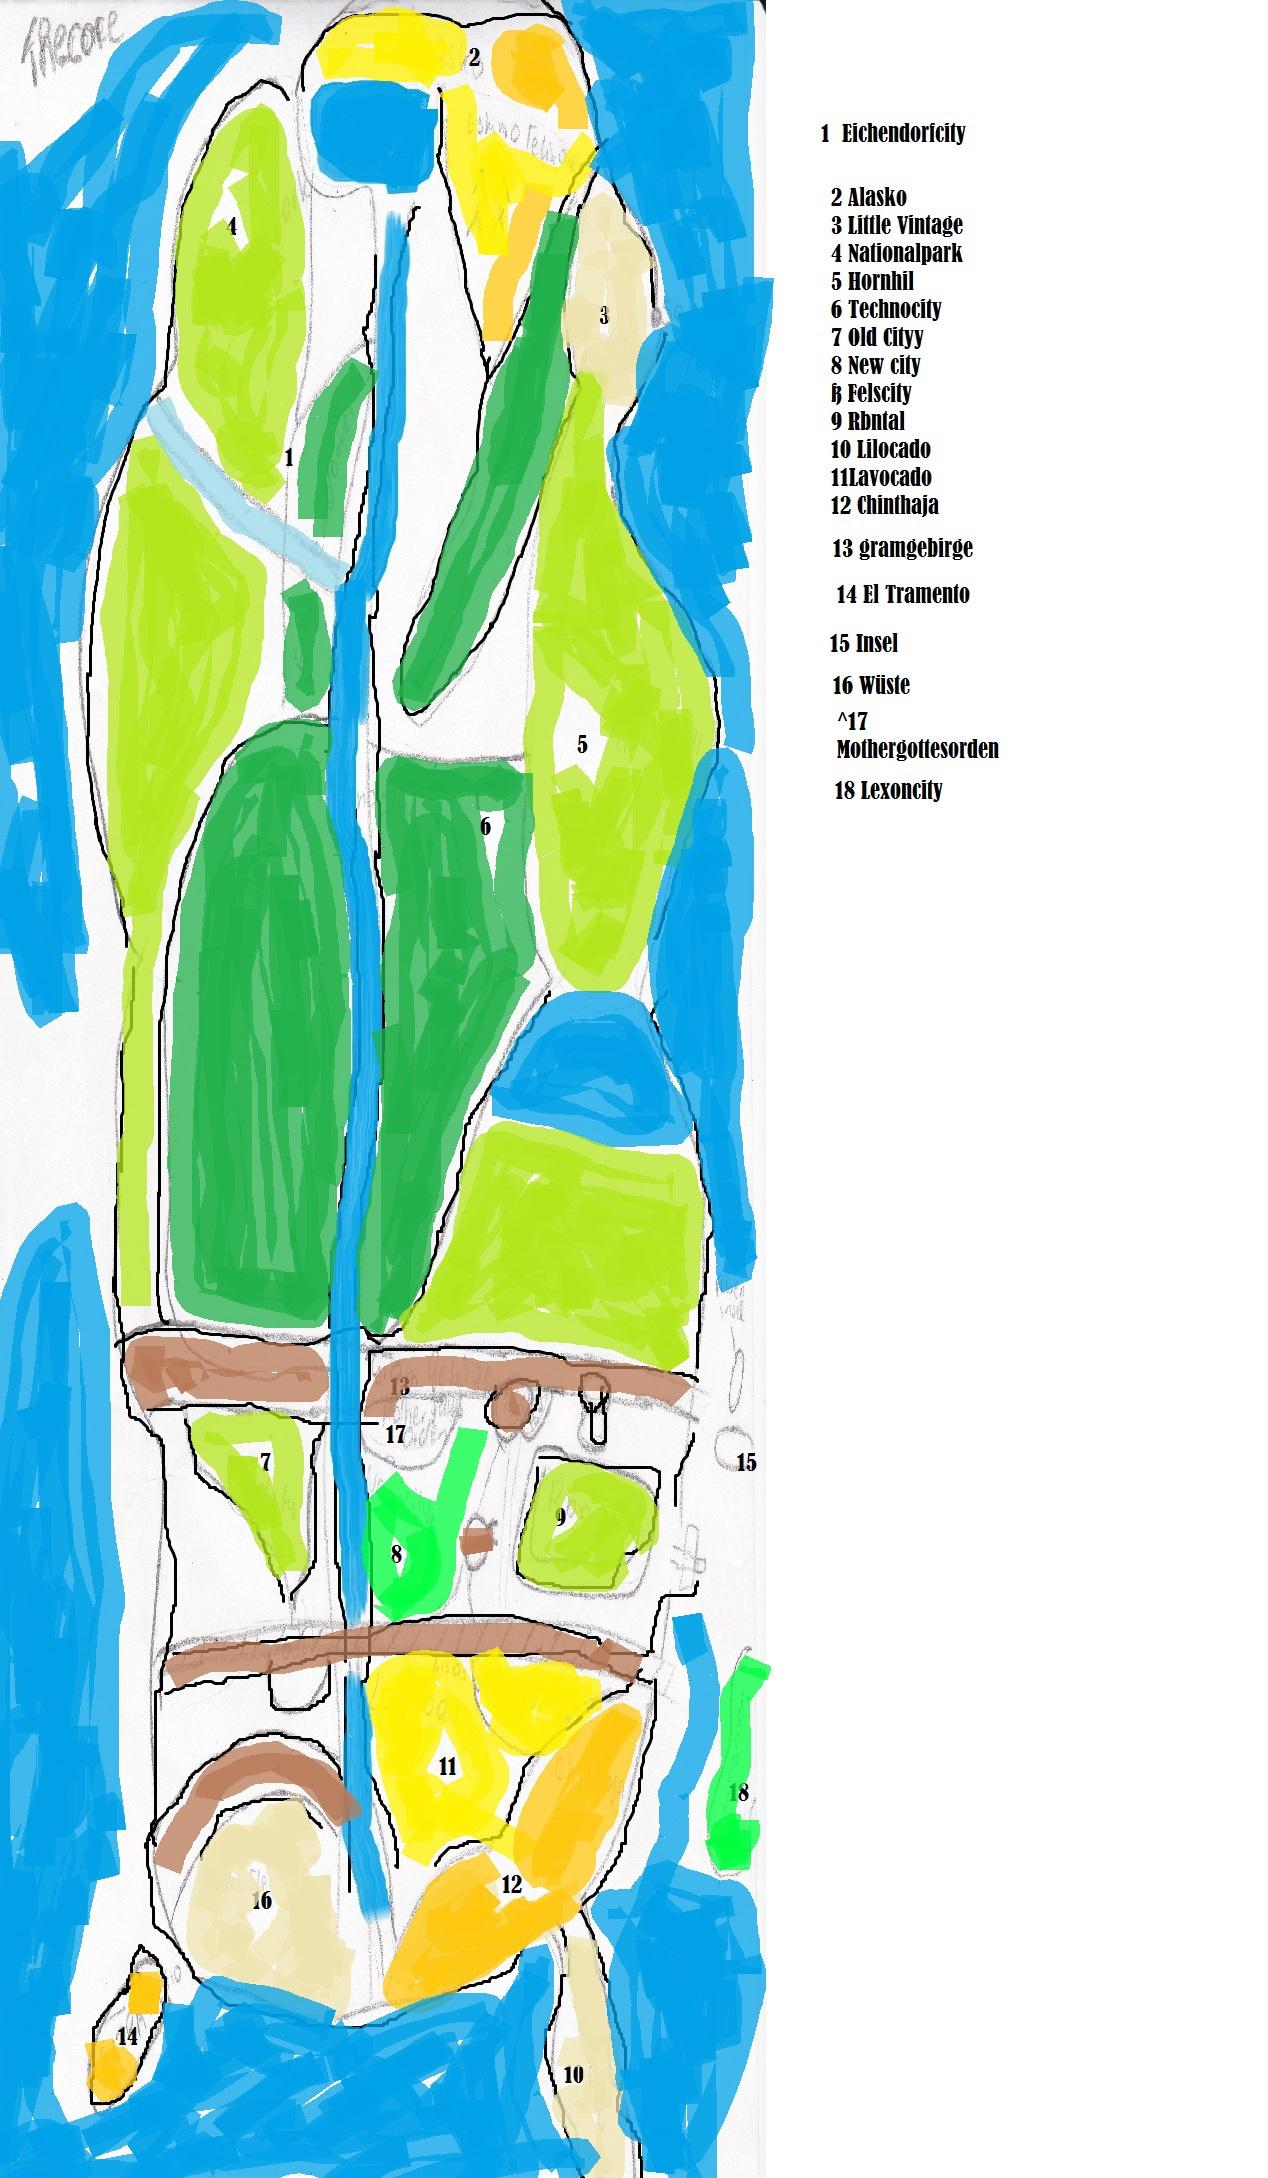 corelandkarte.jpg